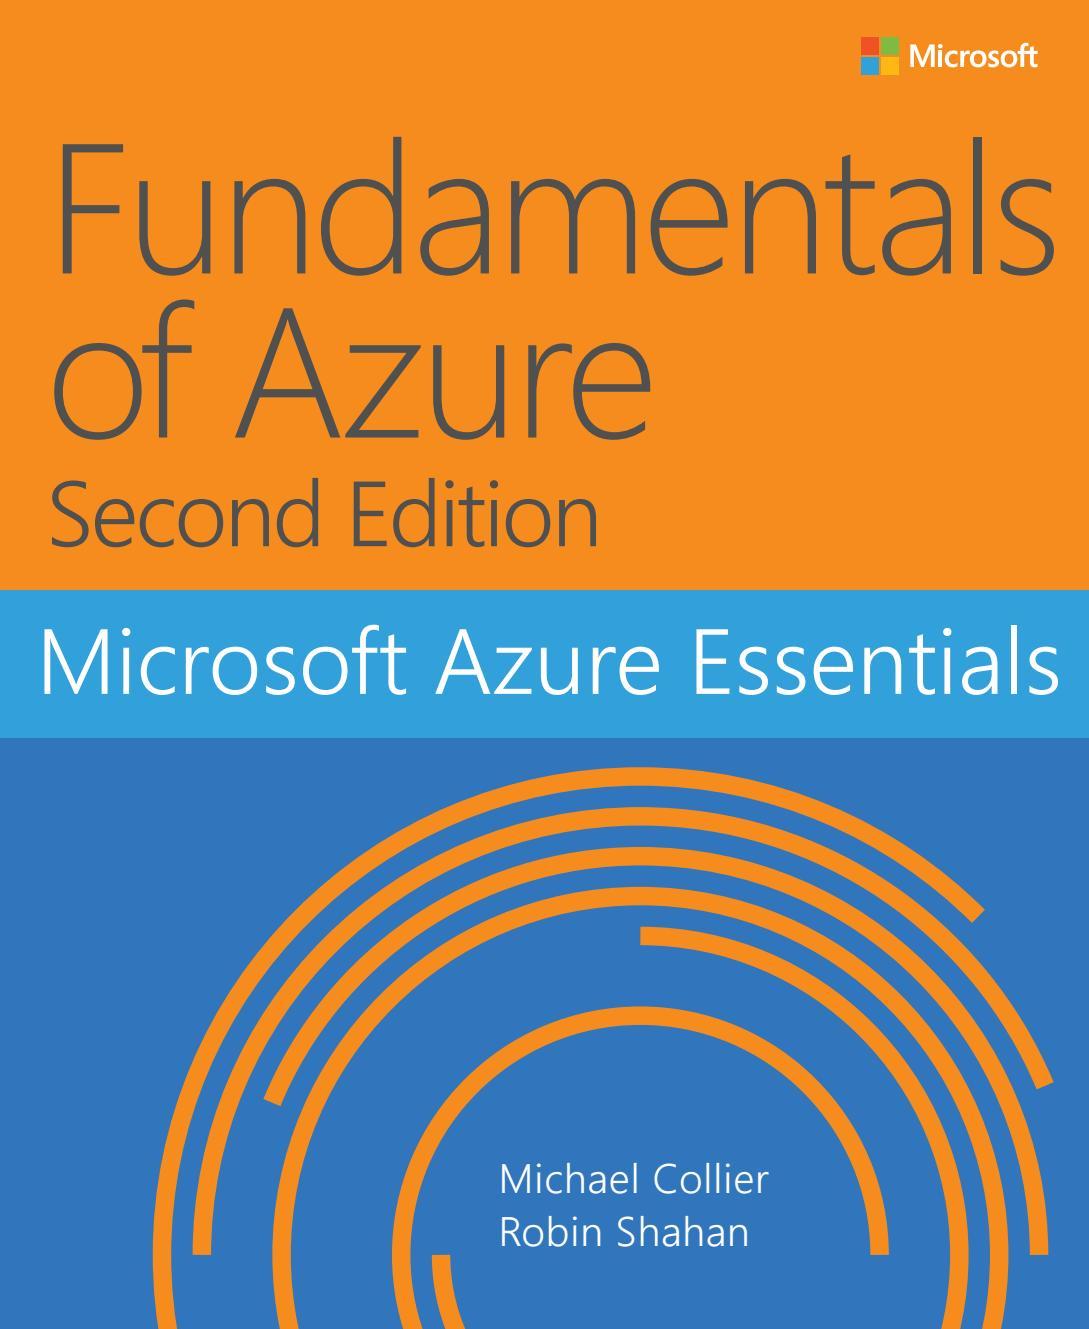 Fundamentals of Azure by LearningTree International - issuu